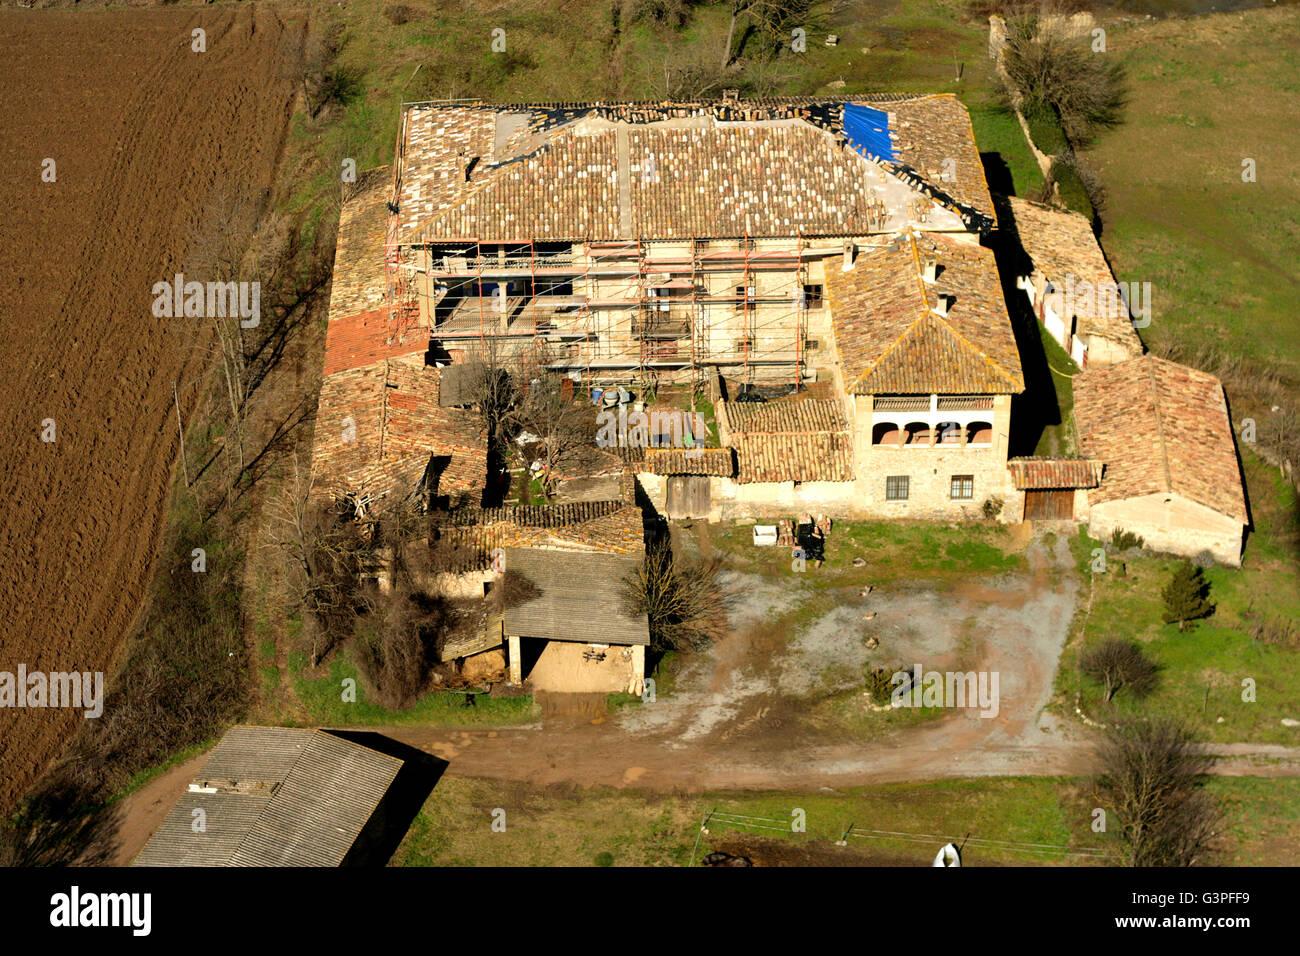 Abandonded home. Plana de Vic. Barcelona province. Catalonia. Spain - Stock Image